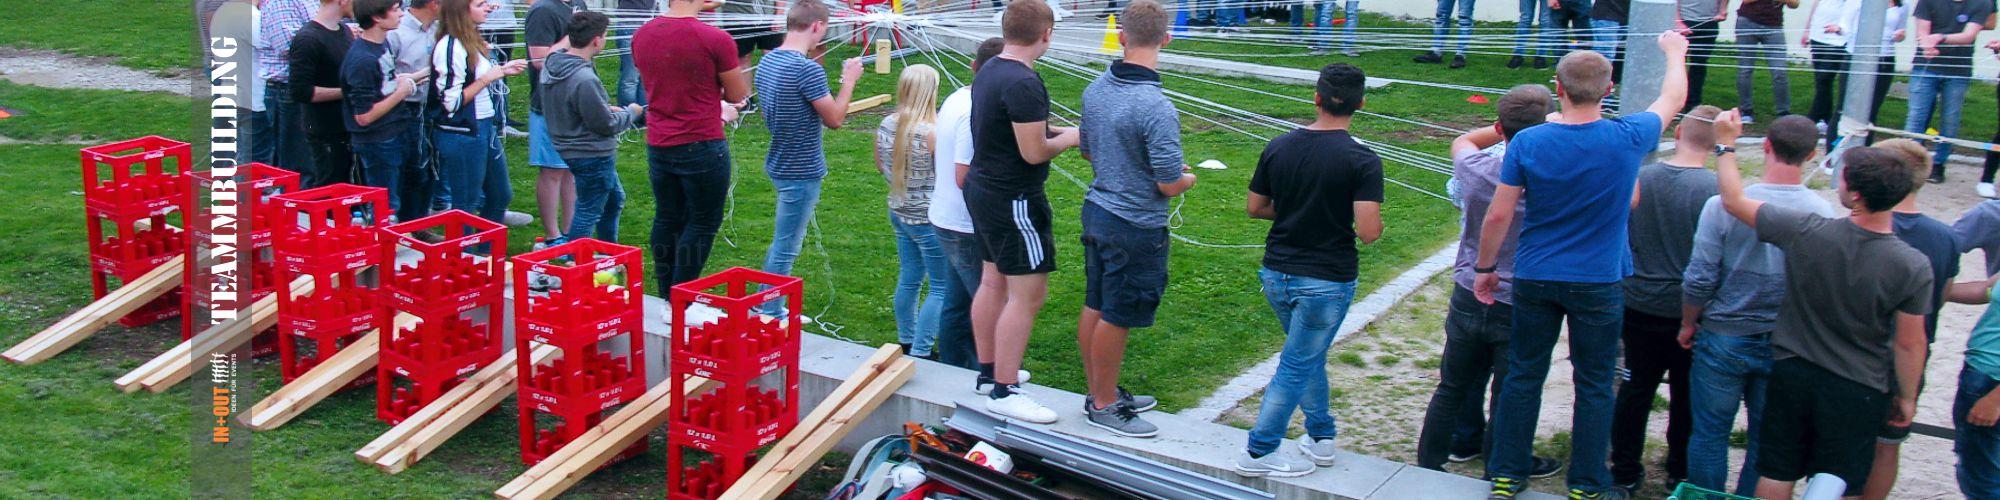 Ideen für Team Events - Azubi Camp - Team Event Mainz